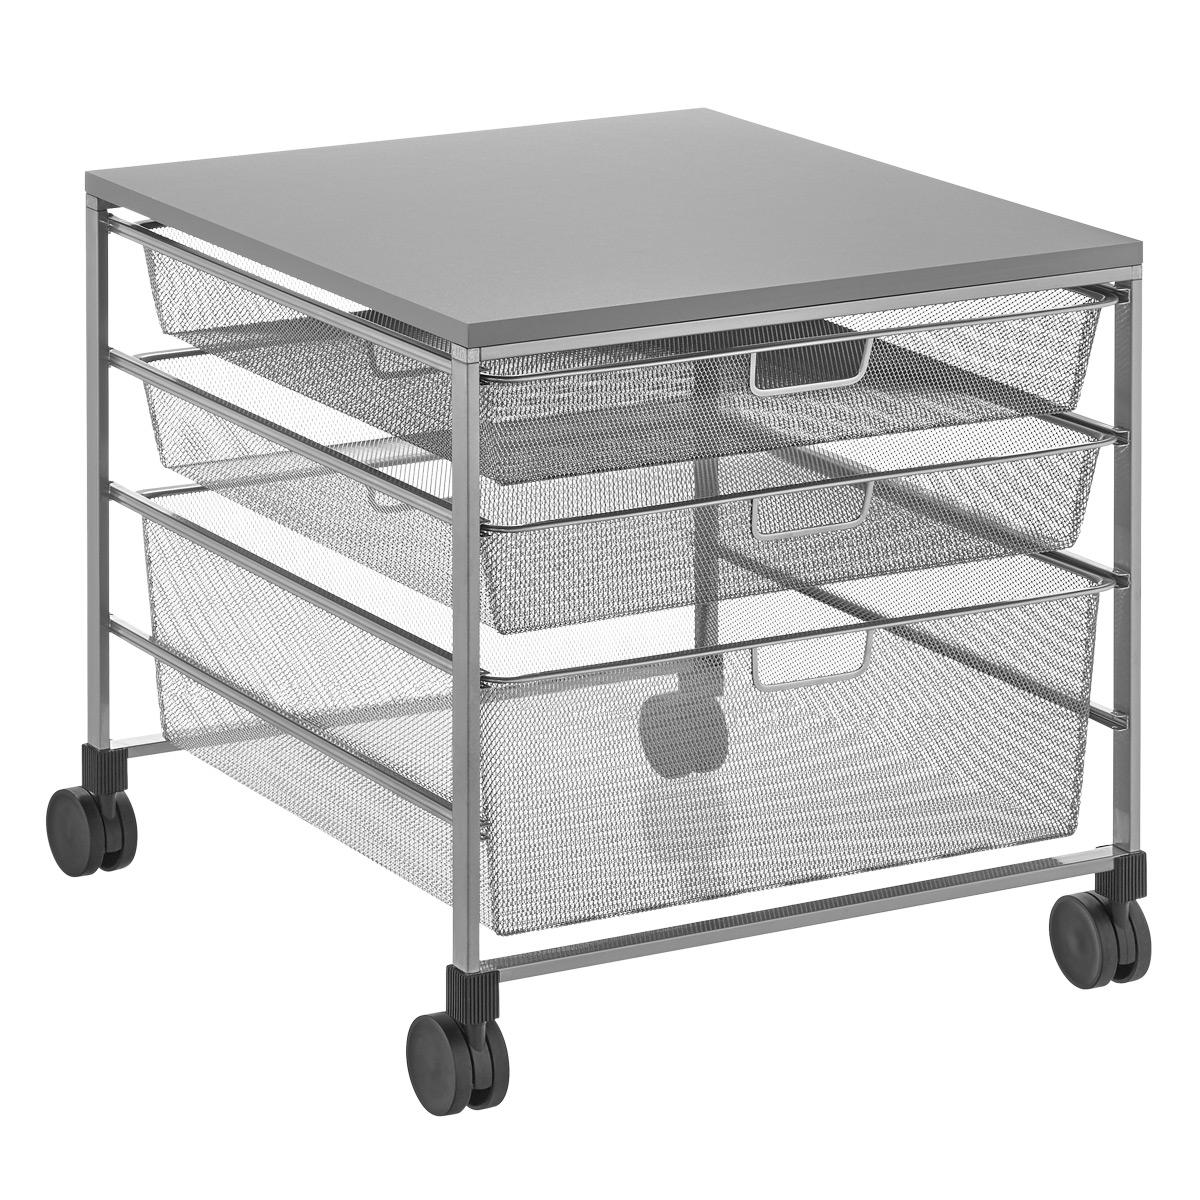 Mesh Compact Fridge Cart